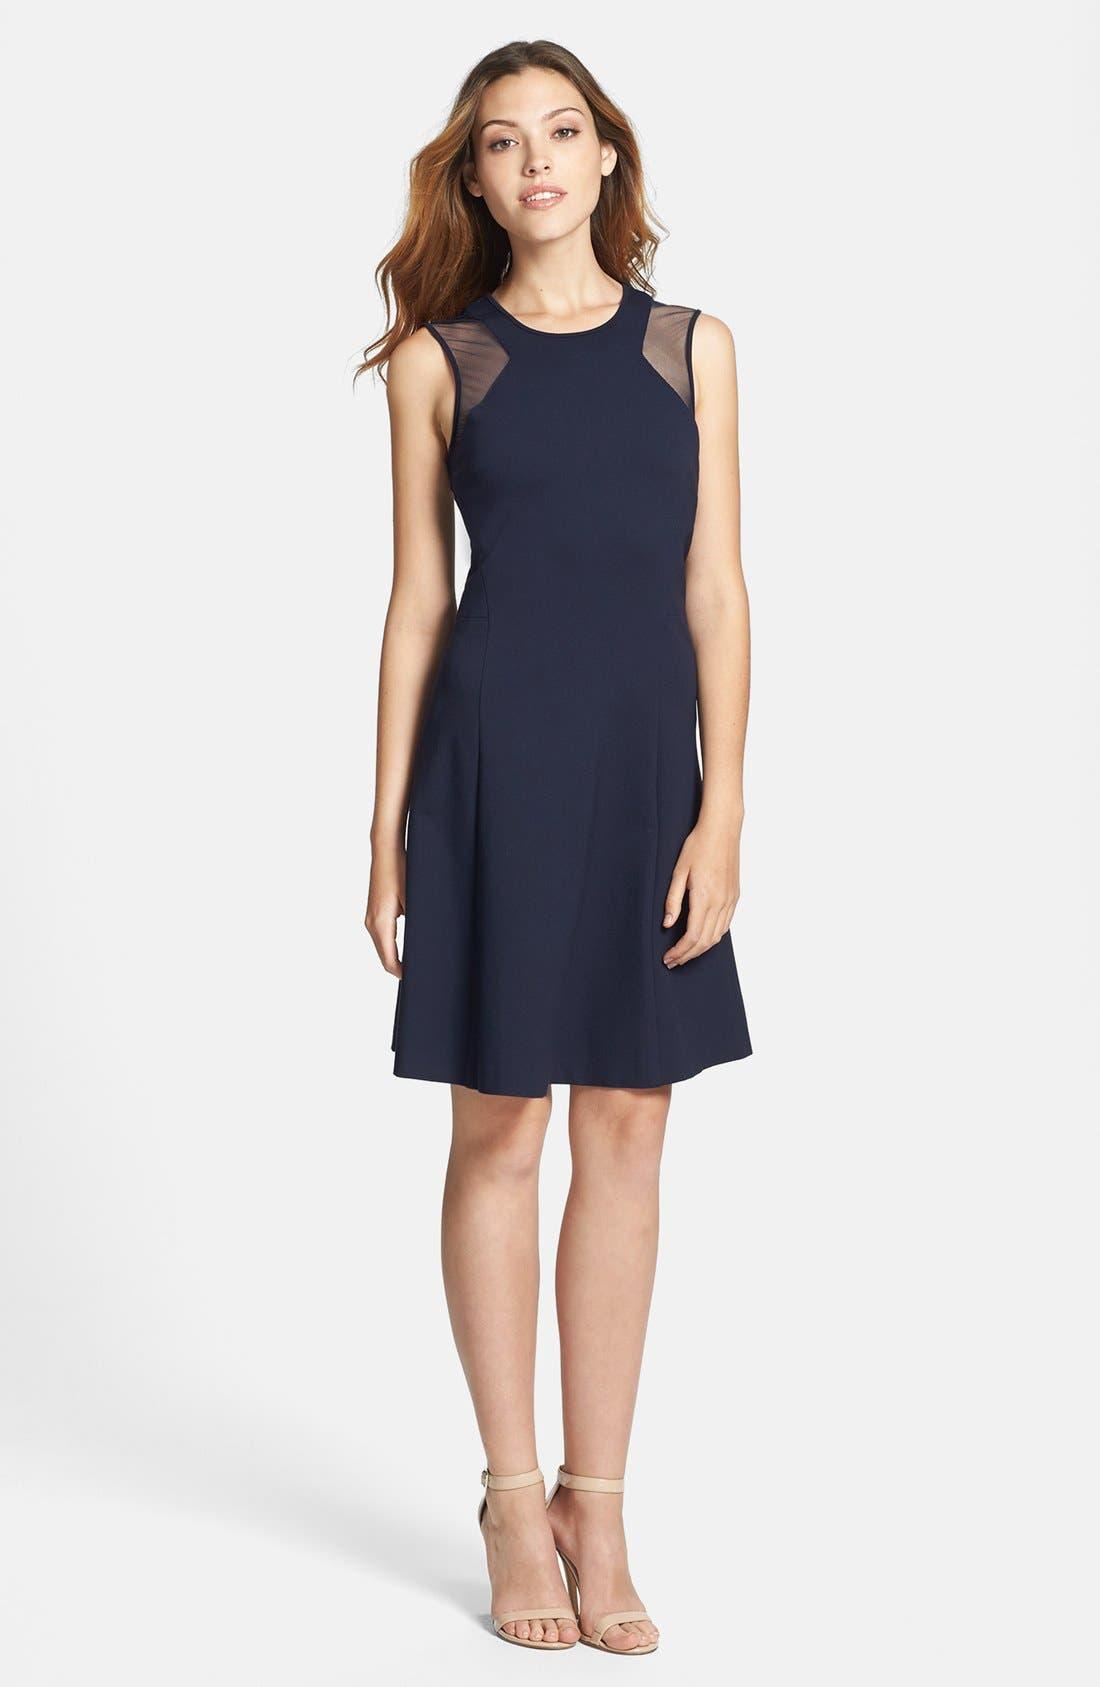 Alternate Image 1 Selected - Vince Camuto Sheer Inset Ponte Dress